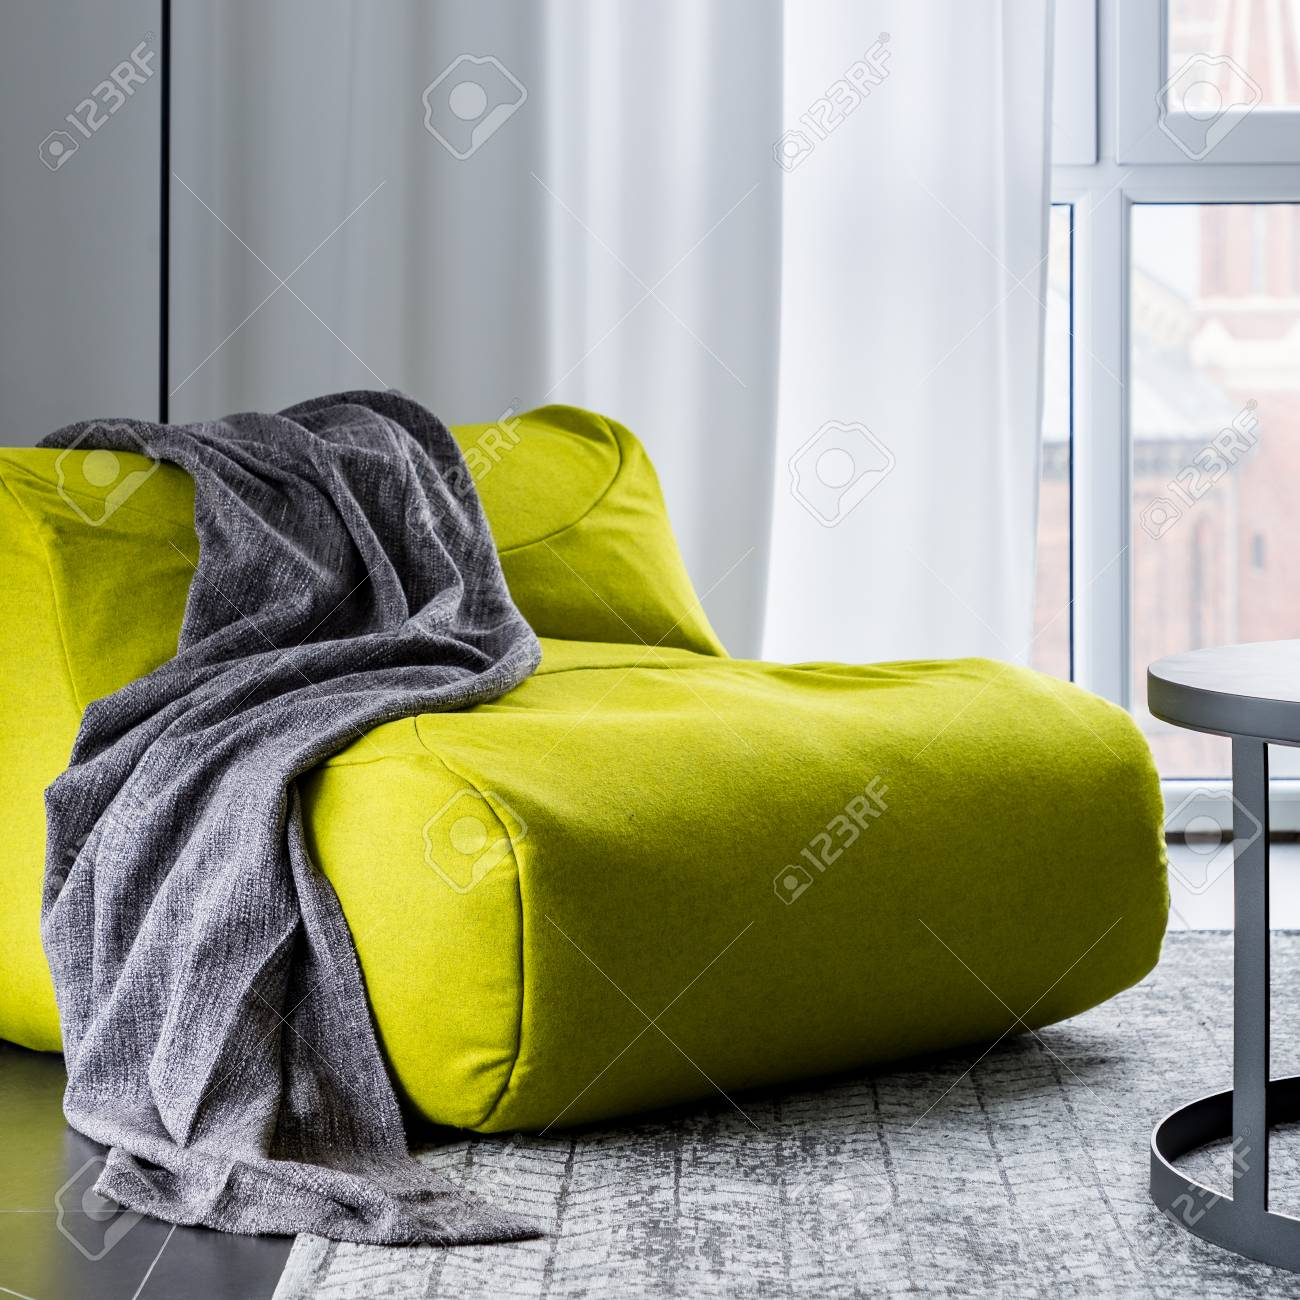 Stupendous Apartment Interior With New Green Bean Bag Sofa Creativecarmelina Interior Chair Design Creativecarmelinacom